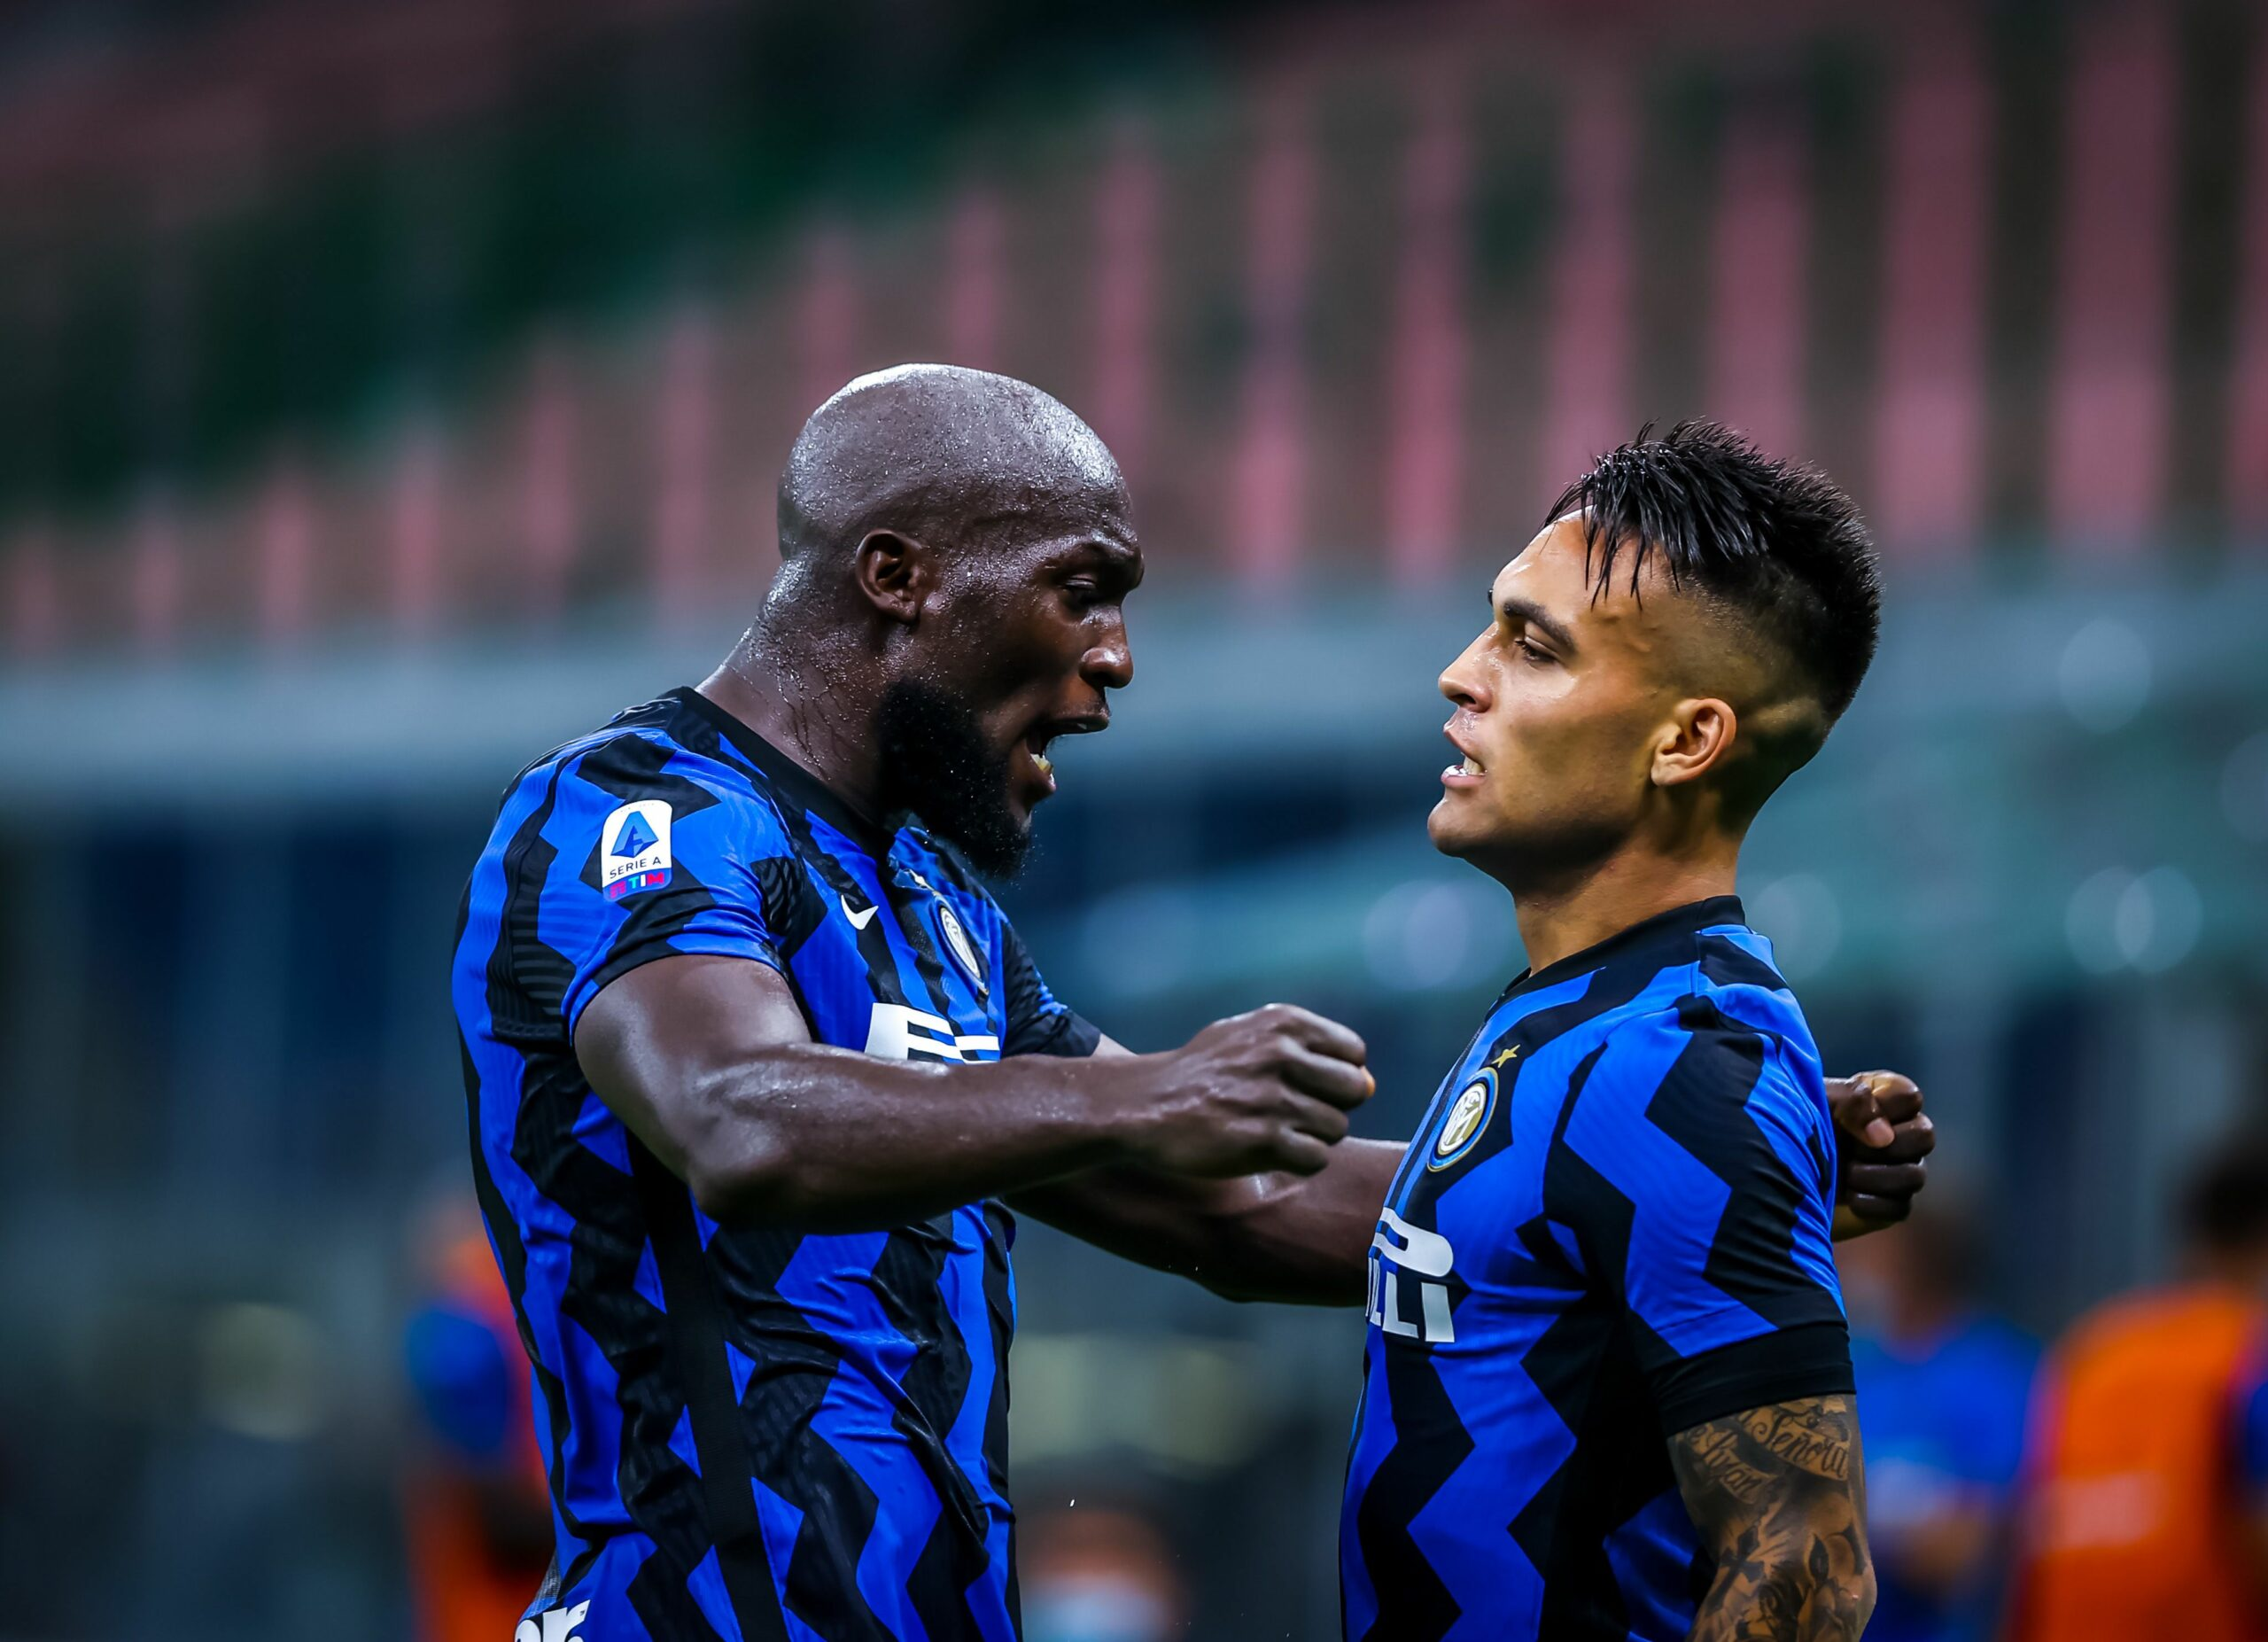 Lukaku i Lautaro celebren un gol  Europa Press